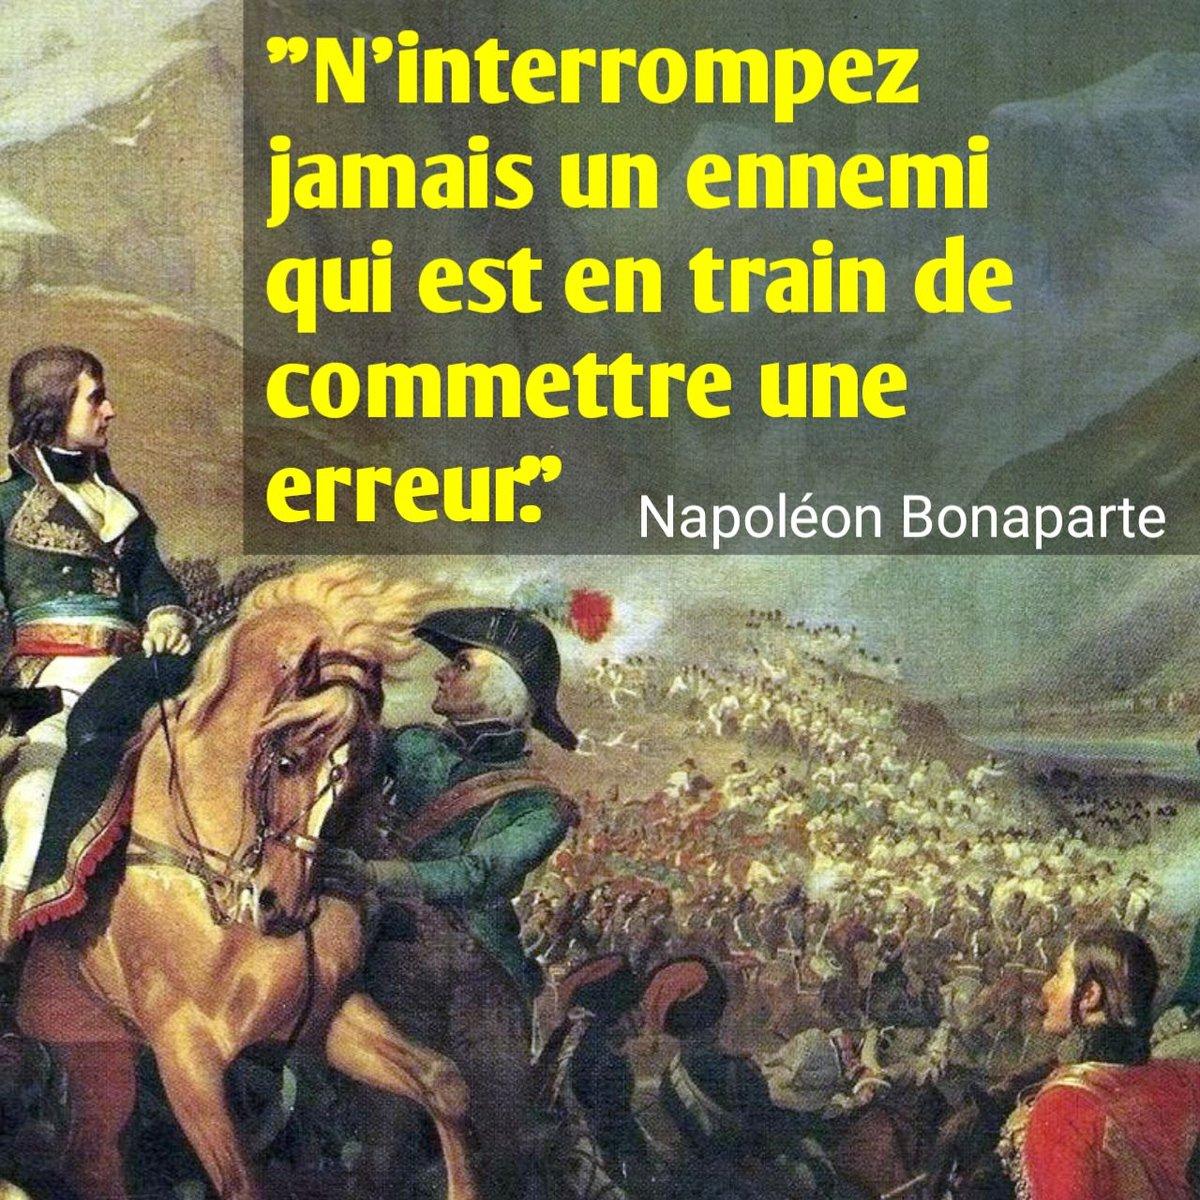 #citation #citations #citationoftheday #instacitation #instacitations #citationdujour #citationdusoir #phrasedujour #phrasedusoir #proverbe #proberbedujour #inspiration #motivation #retweet #texte #france #françaispic.twitter.com/OqSYqQUzue